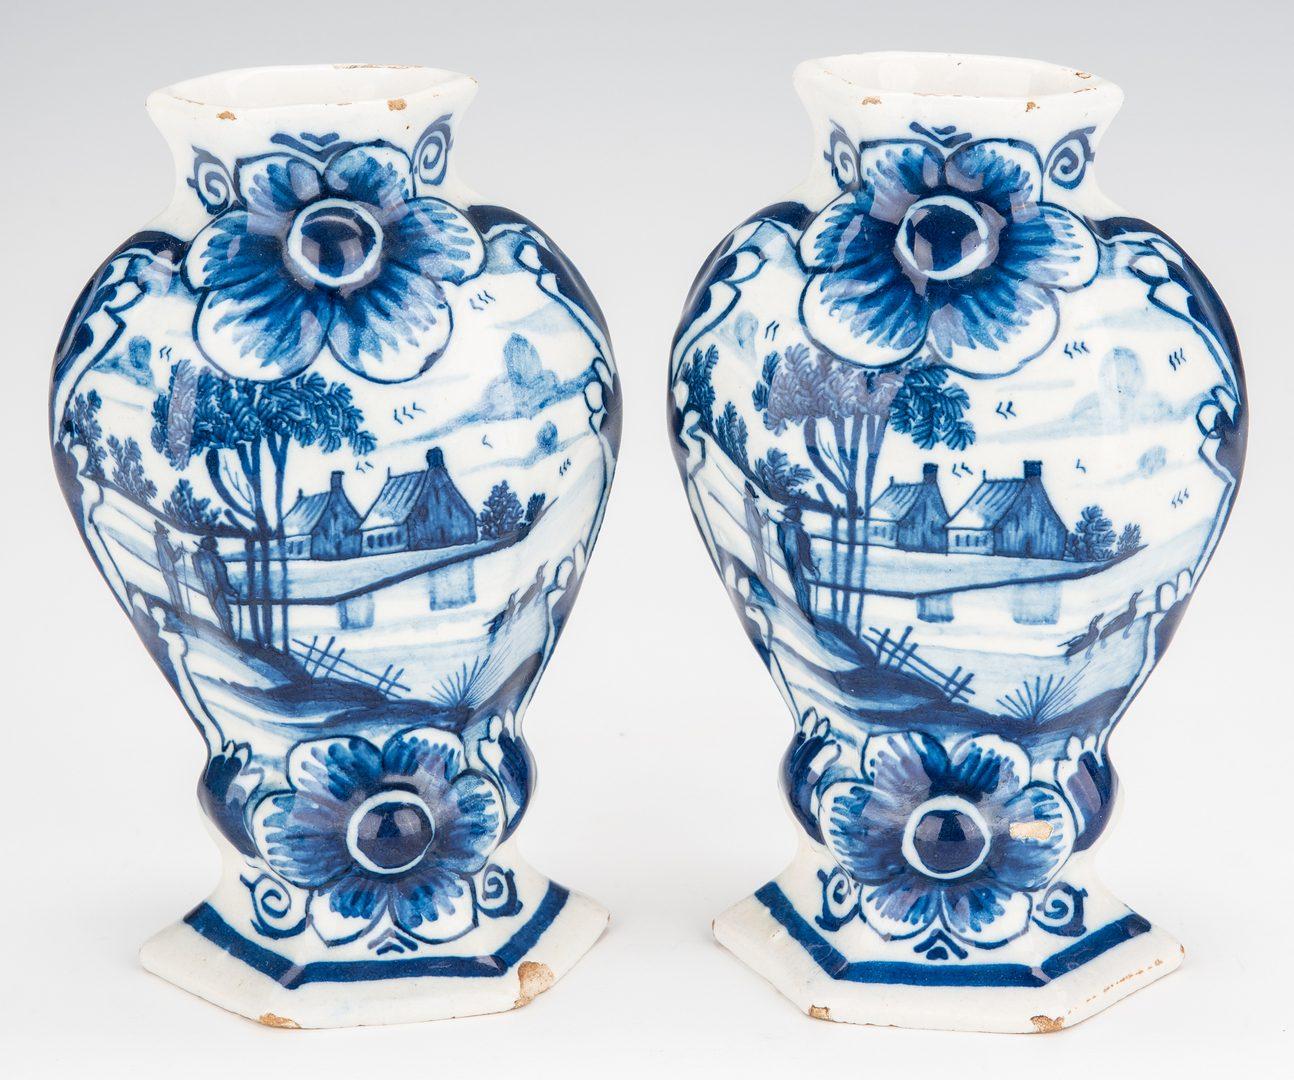 Lot 352: 5 Blue & White Ceramic Items, inc. Delft